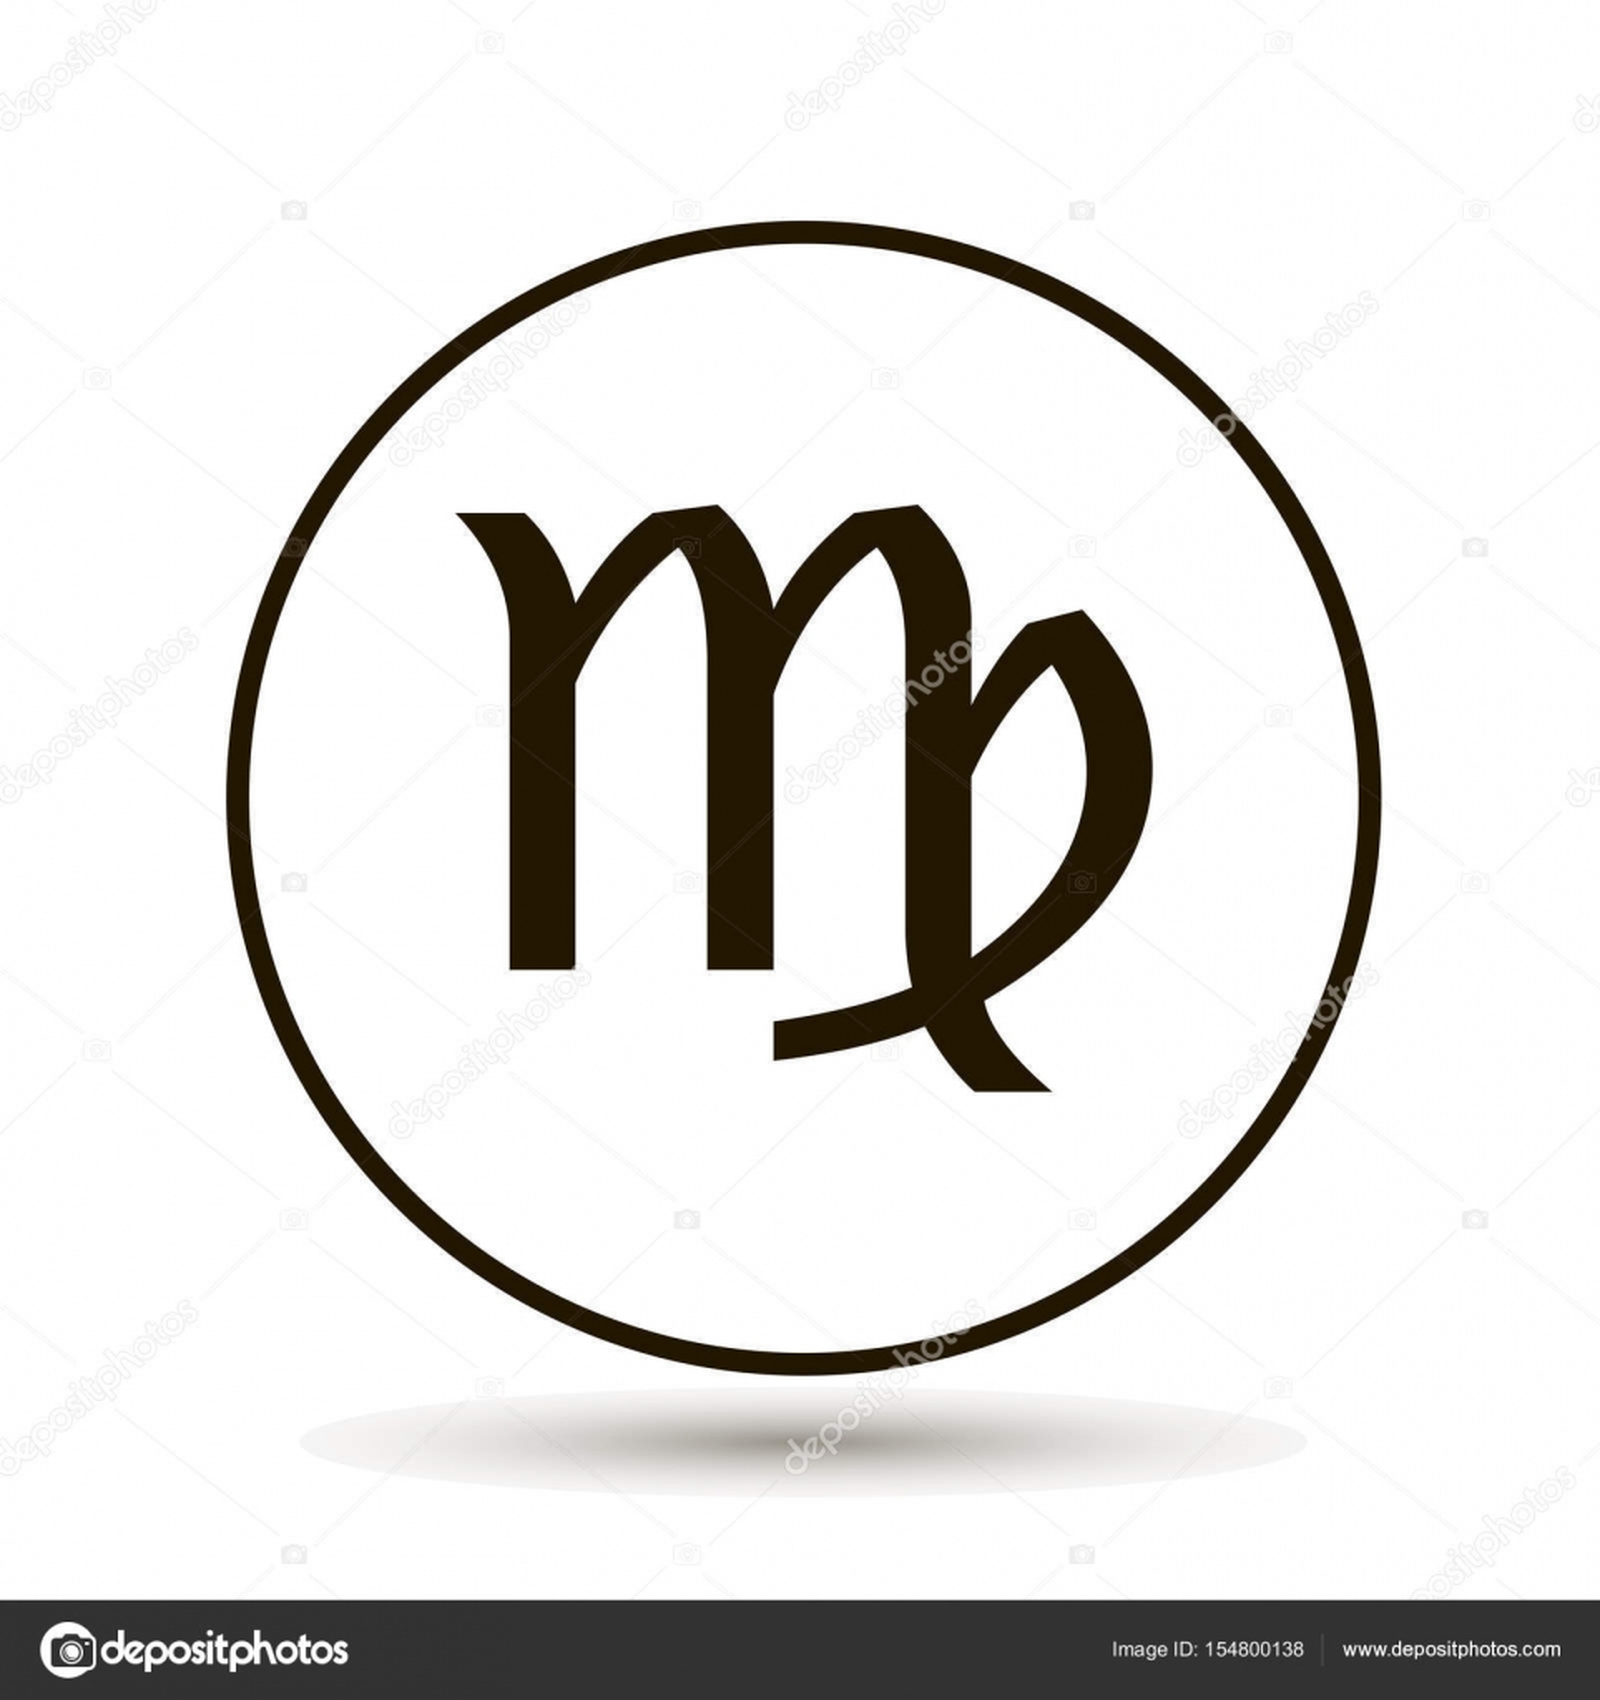 Virgo zodiac sign astrological symbol icon in circle stock virgo zodiac sign astrological symbol icon in circle stock vector buycottarizona Gallery